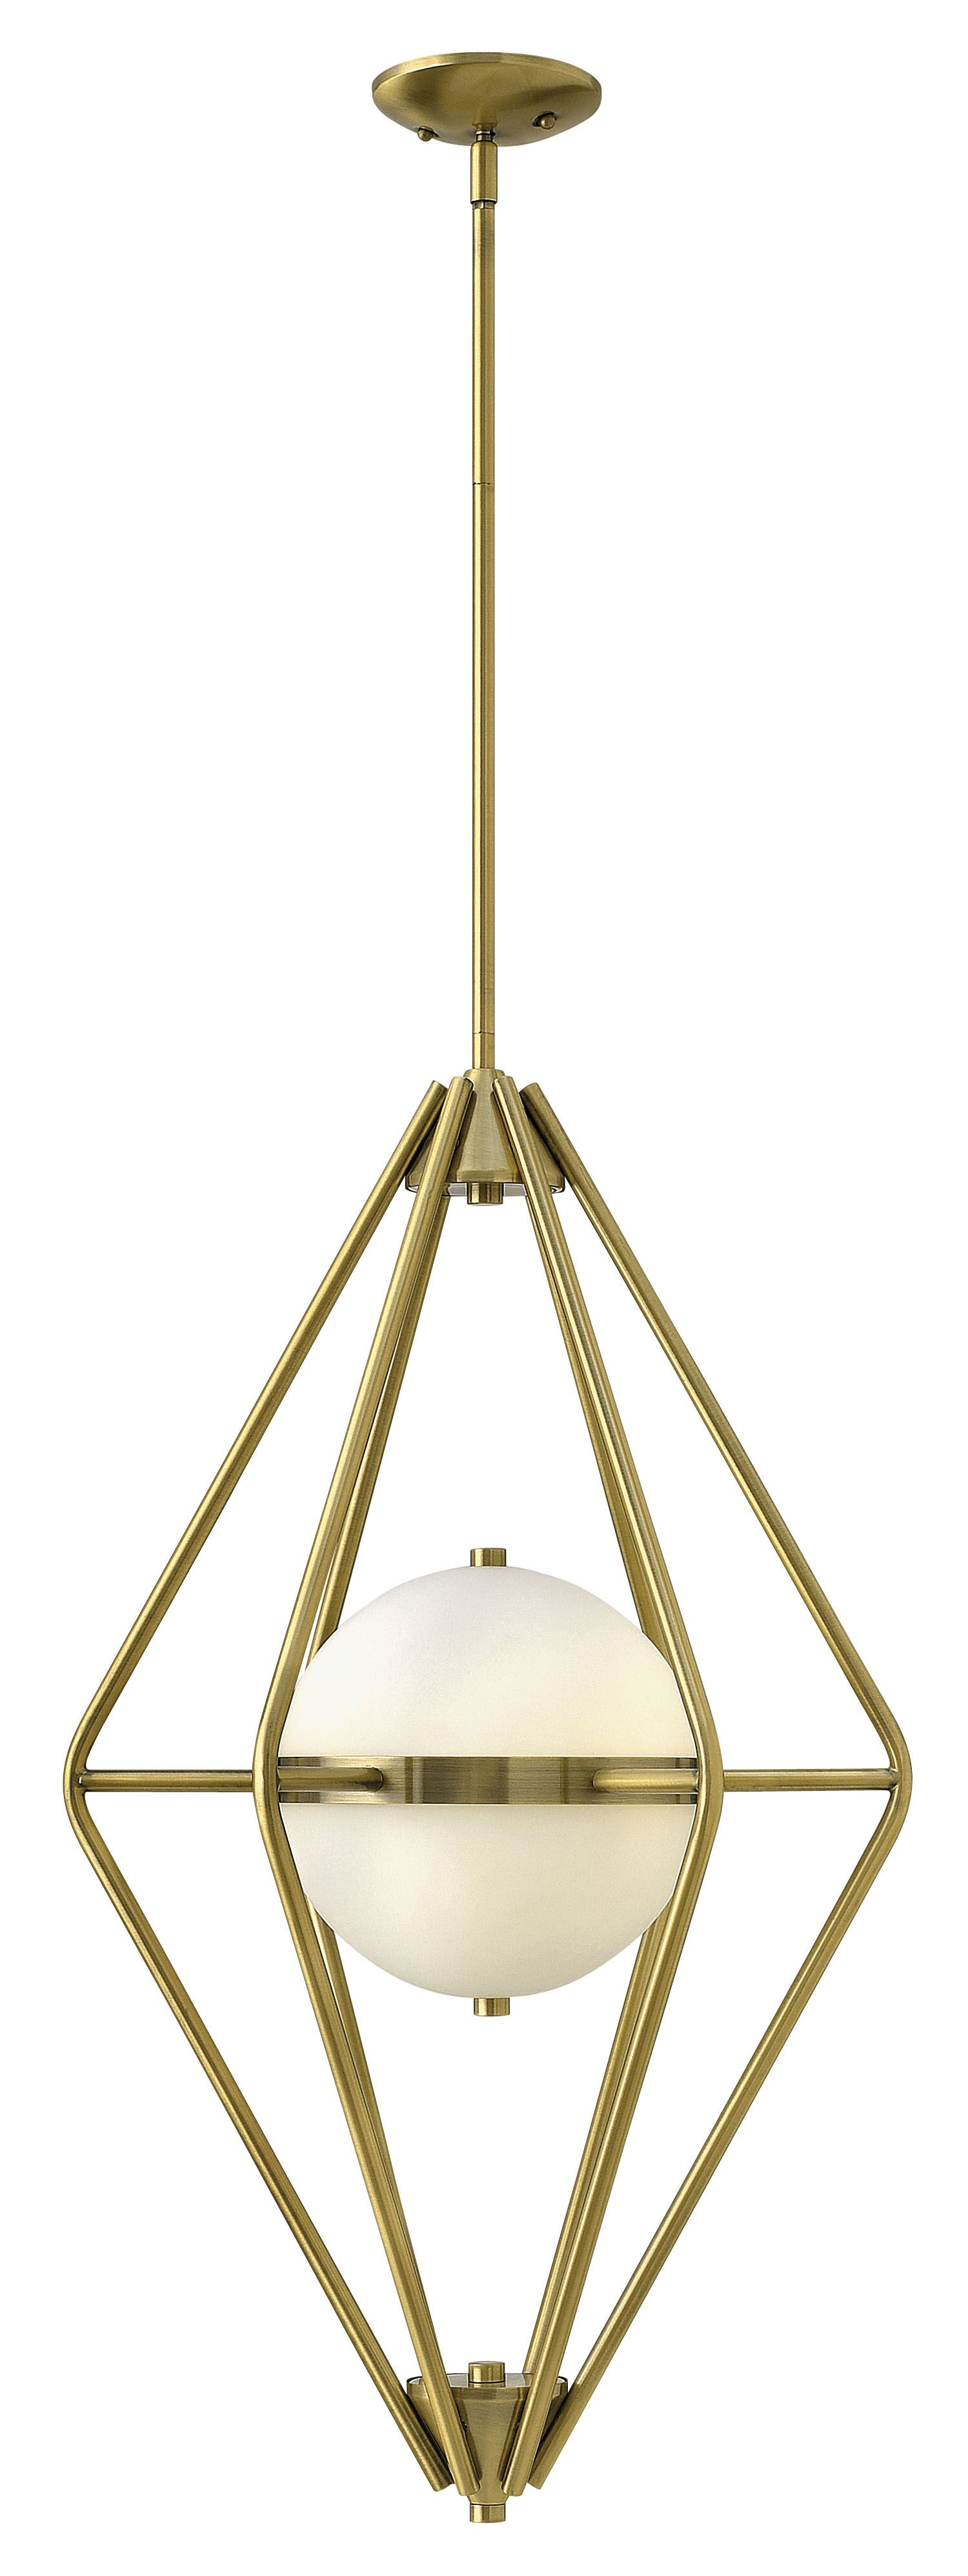 Spectra 2-Light Geometric Chandelier Finish: Retro Brass